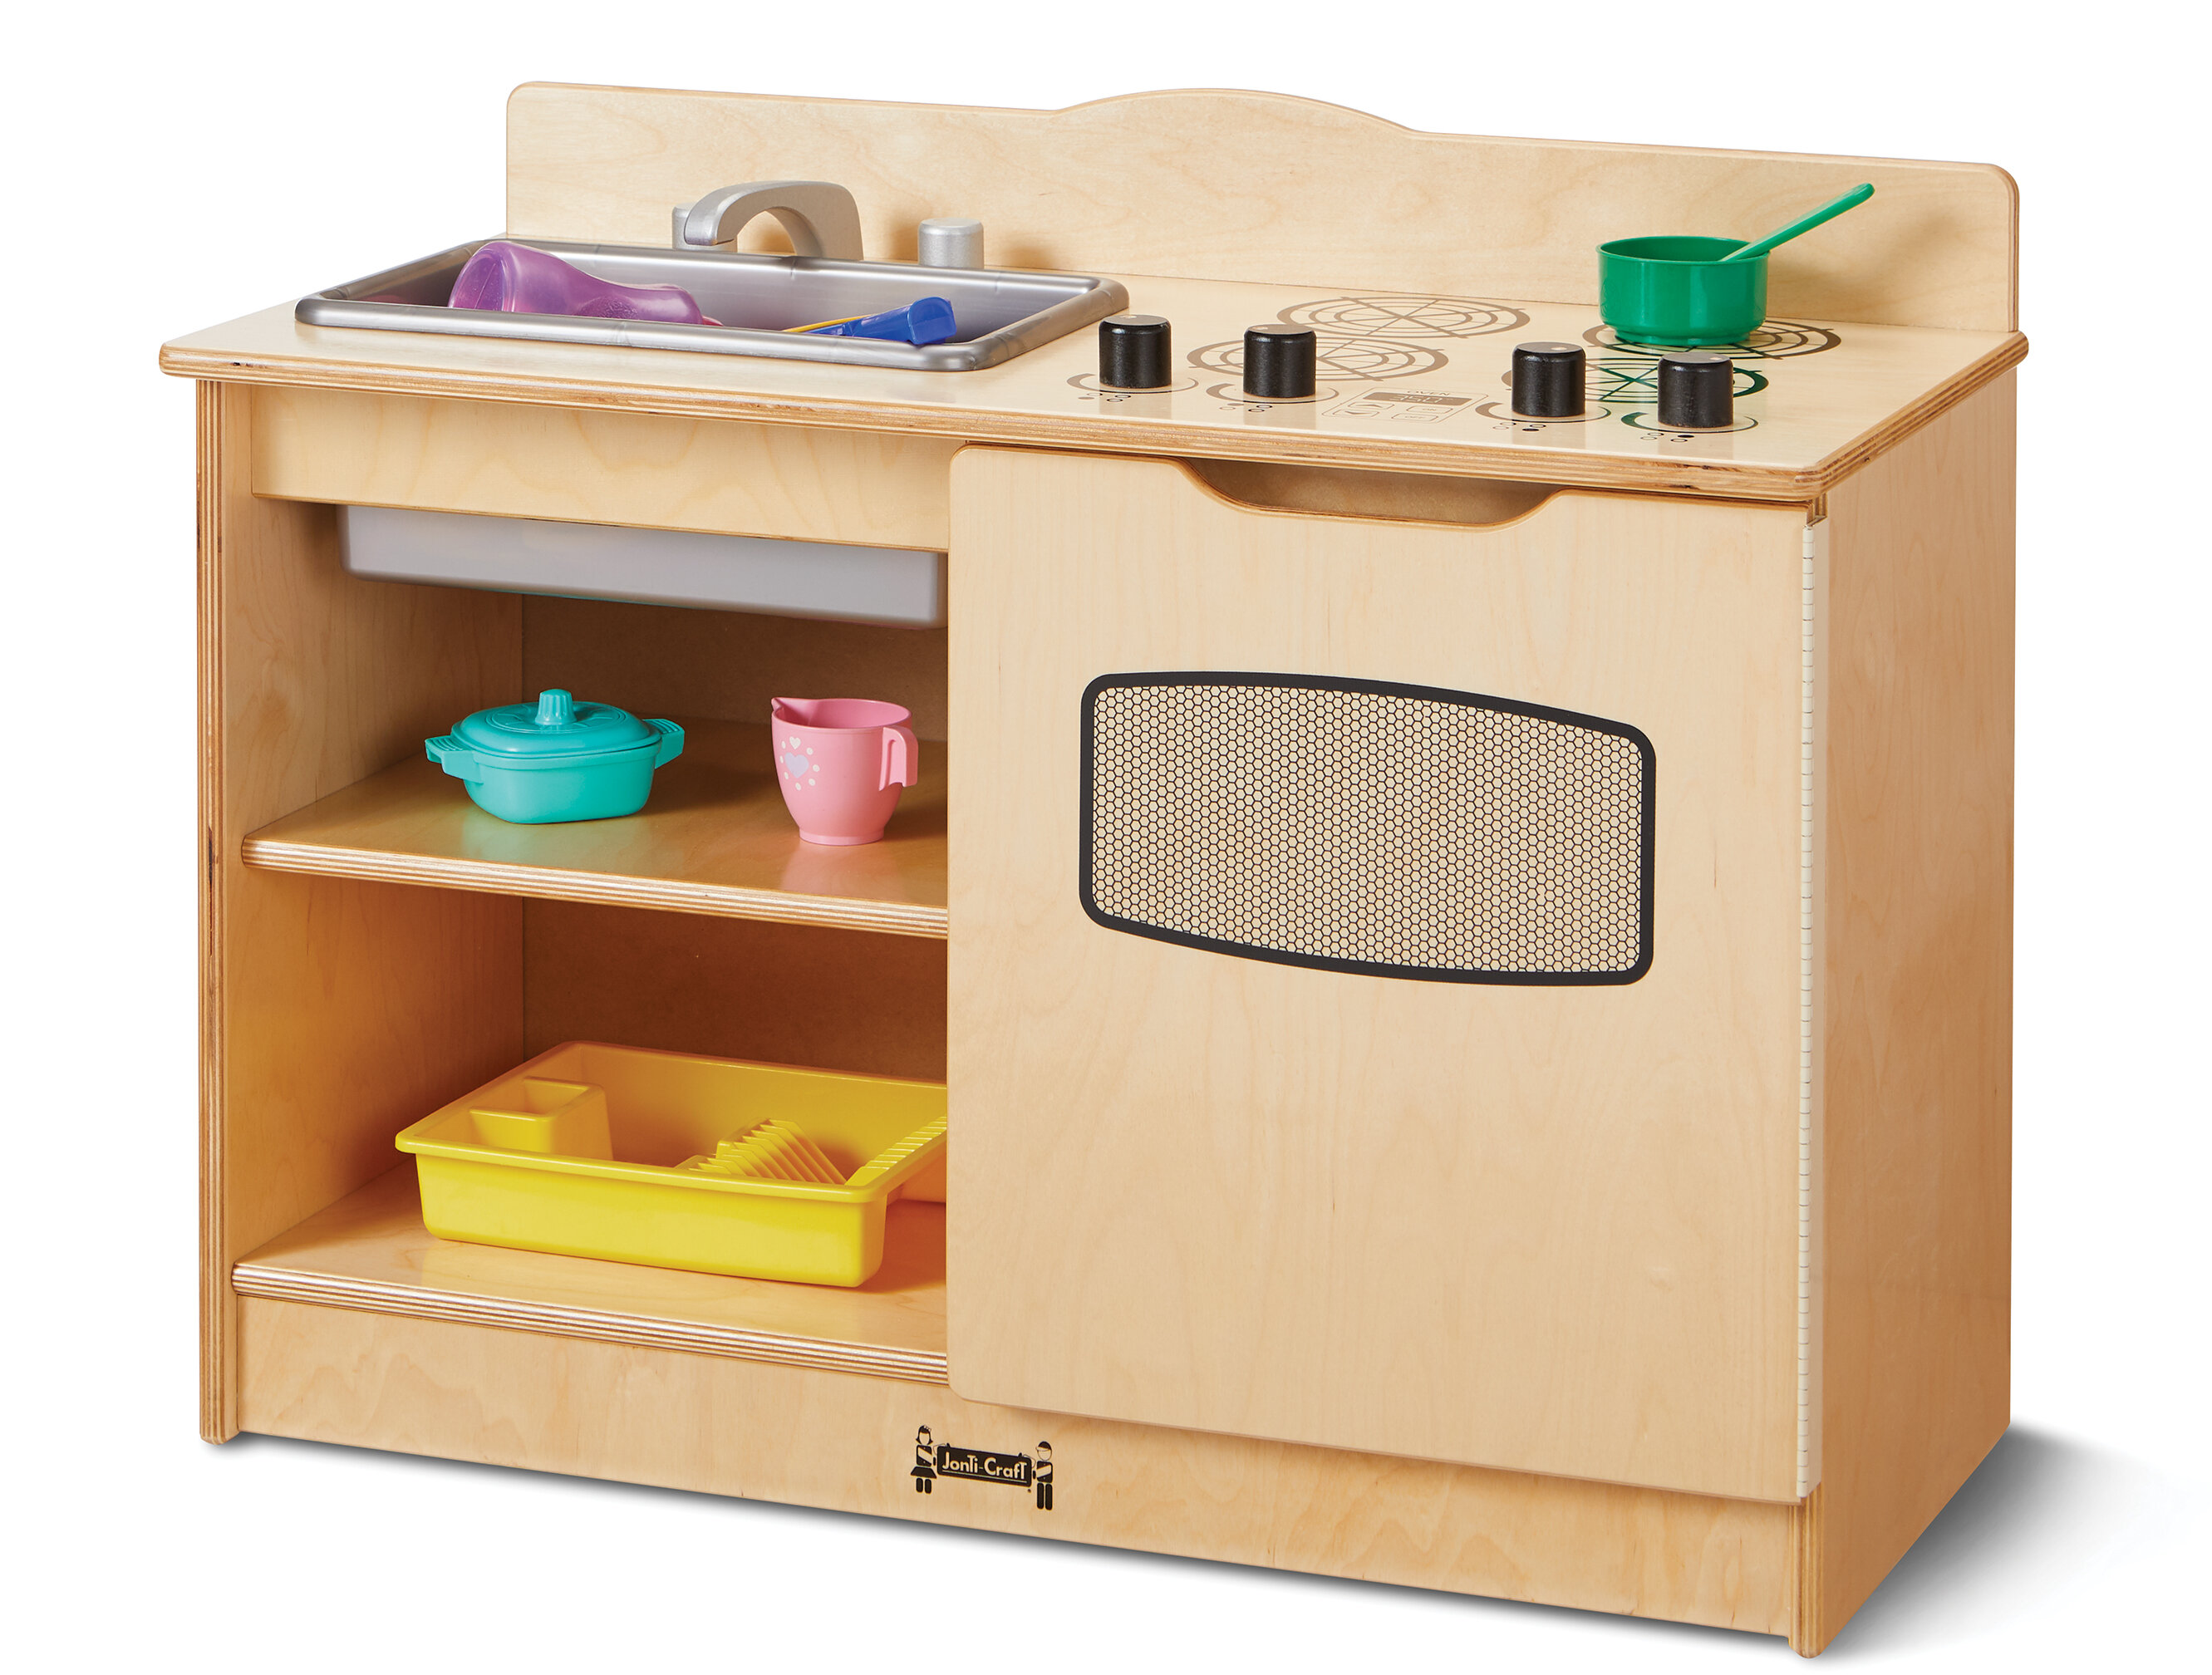 Toddler Café Kitchen Set